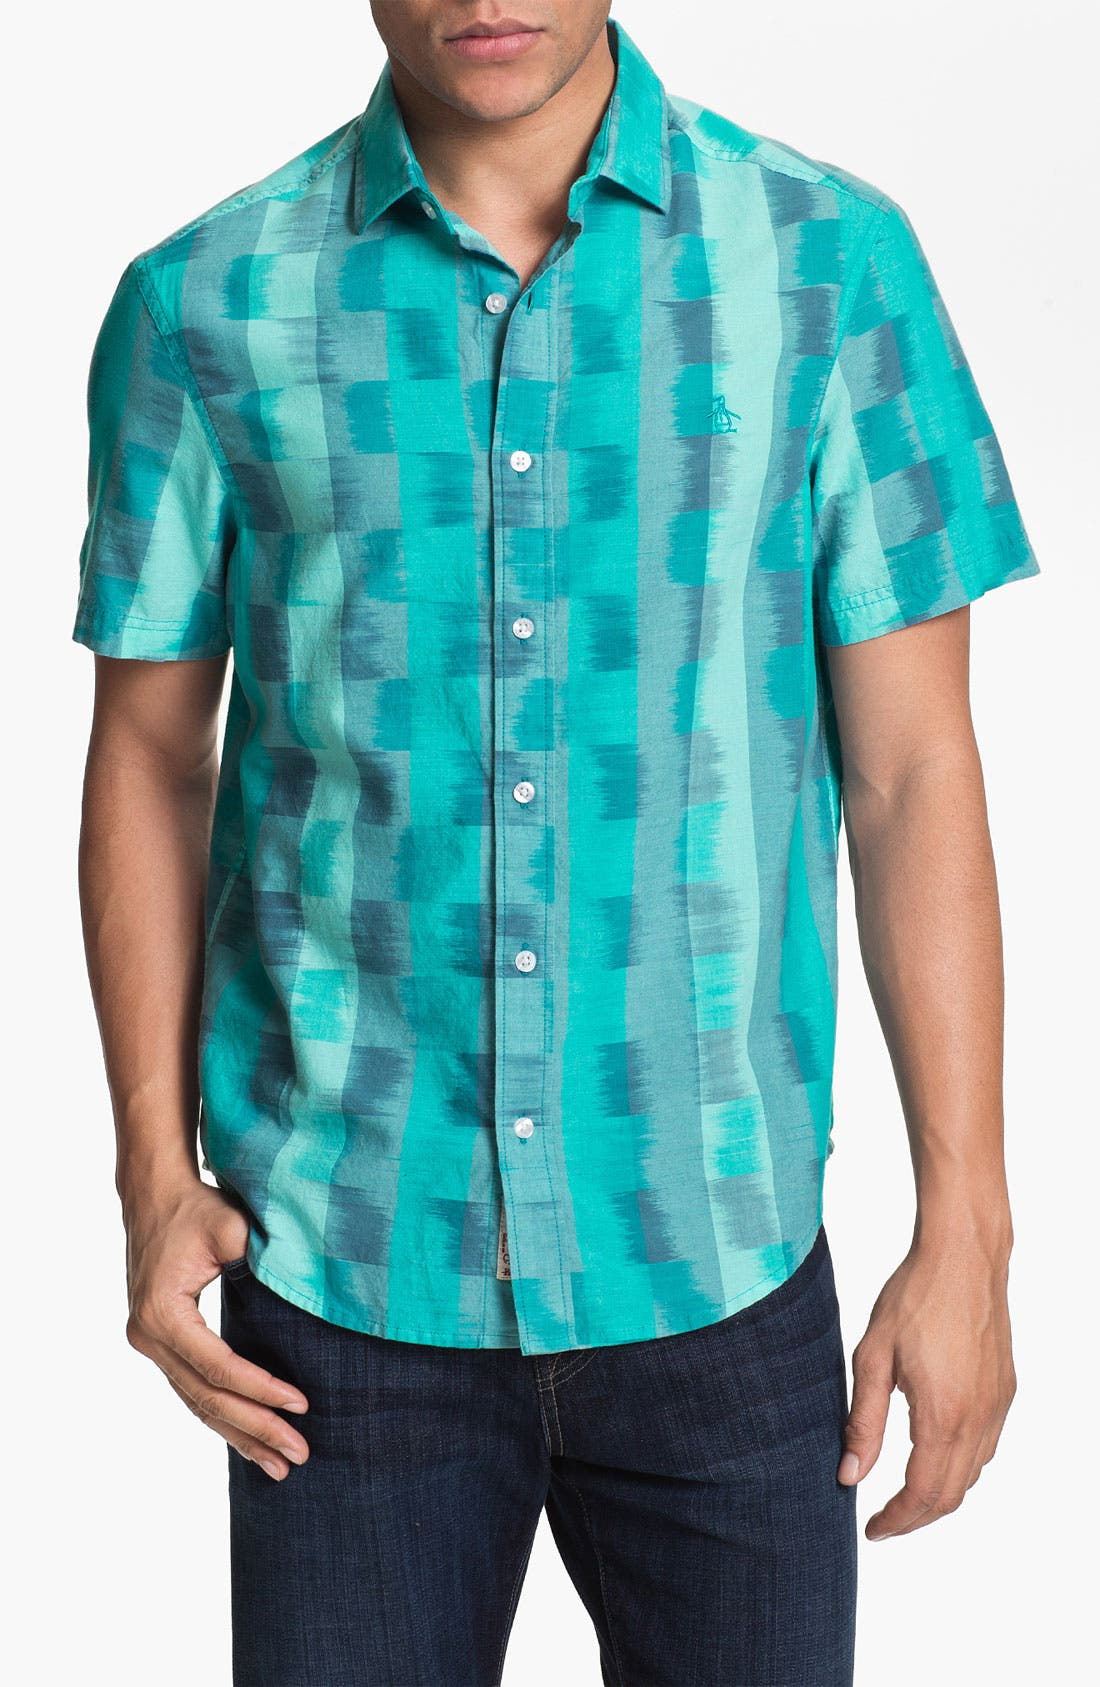 Main Image - Original Penguin Ombré Check Woven Shirt